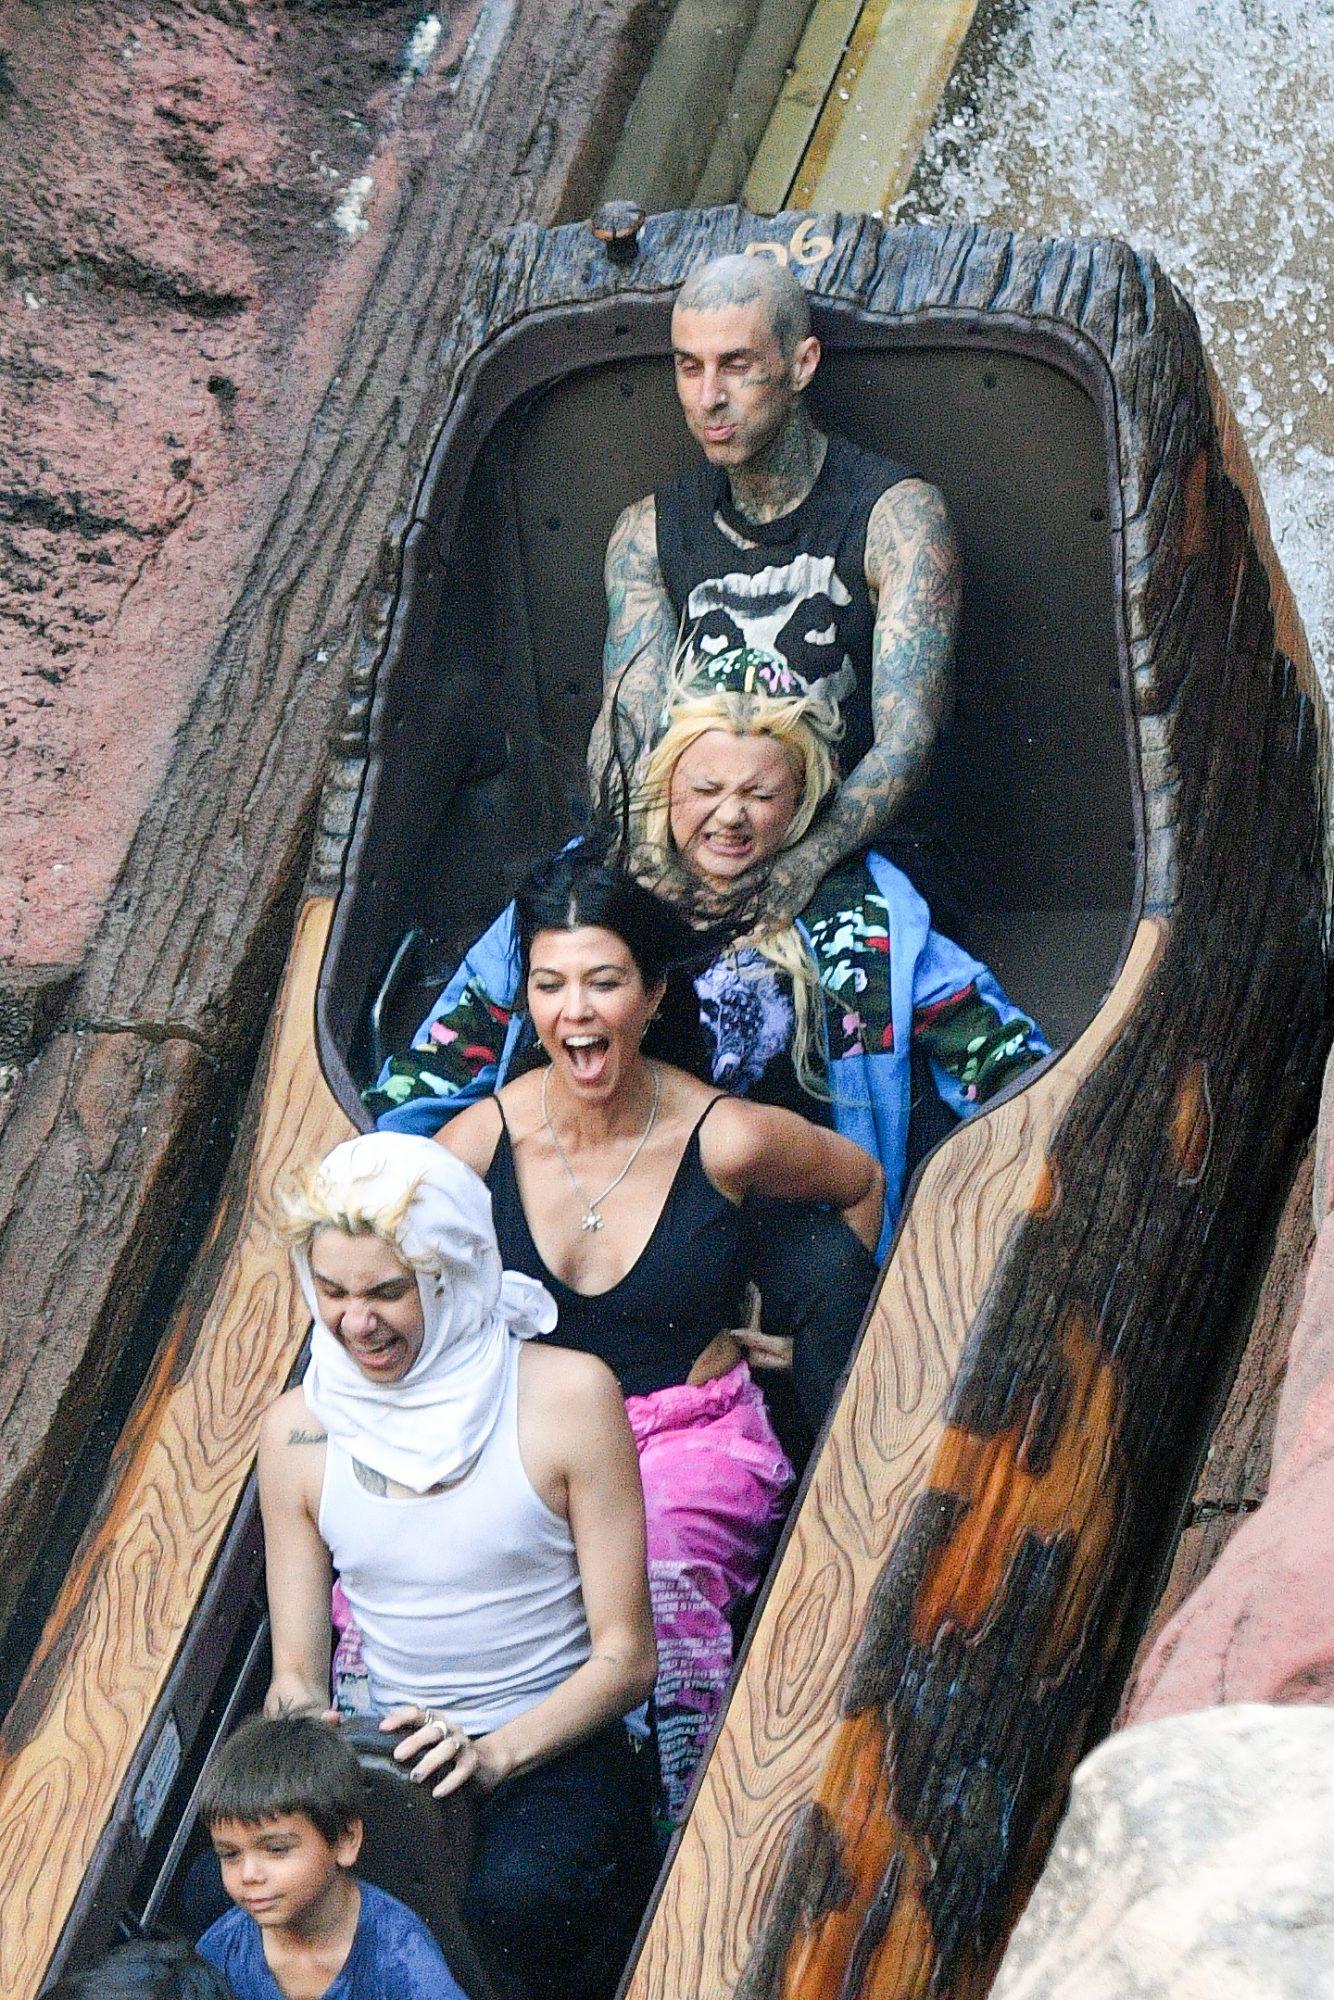 Kourtney Kardashian and Travis Barker Take the Kids to Disneyland